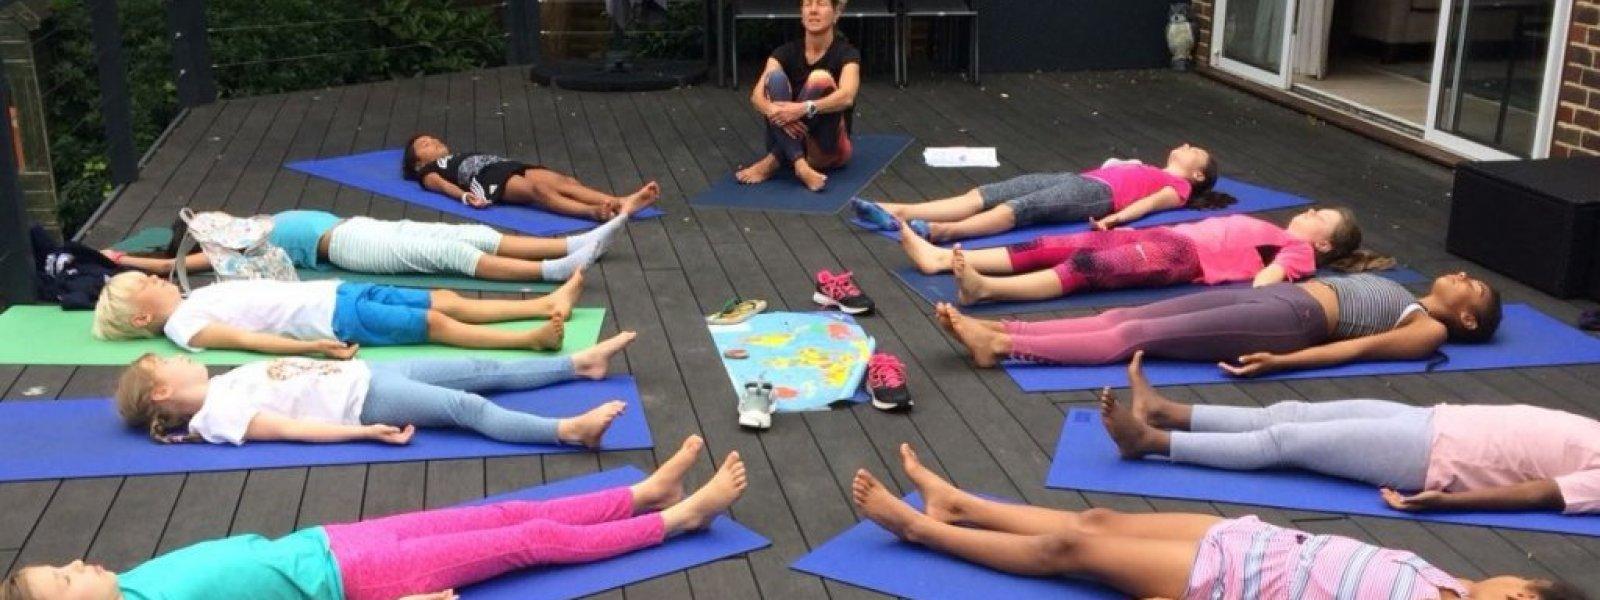 School uses yoga to help calm kids (USA)